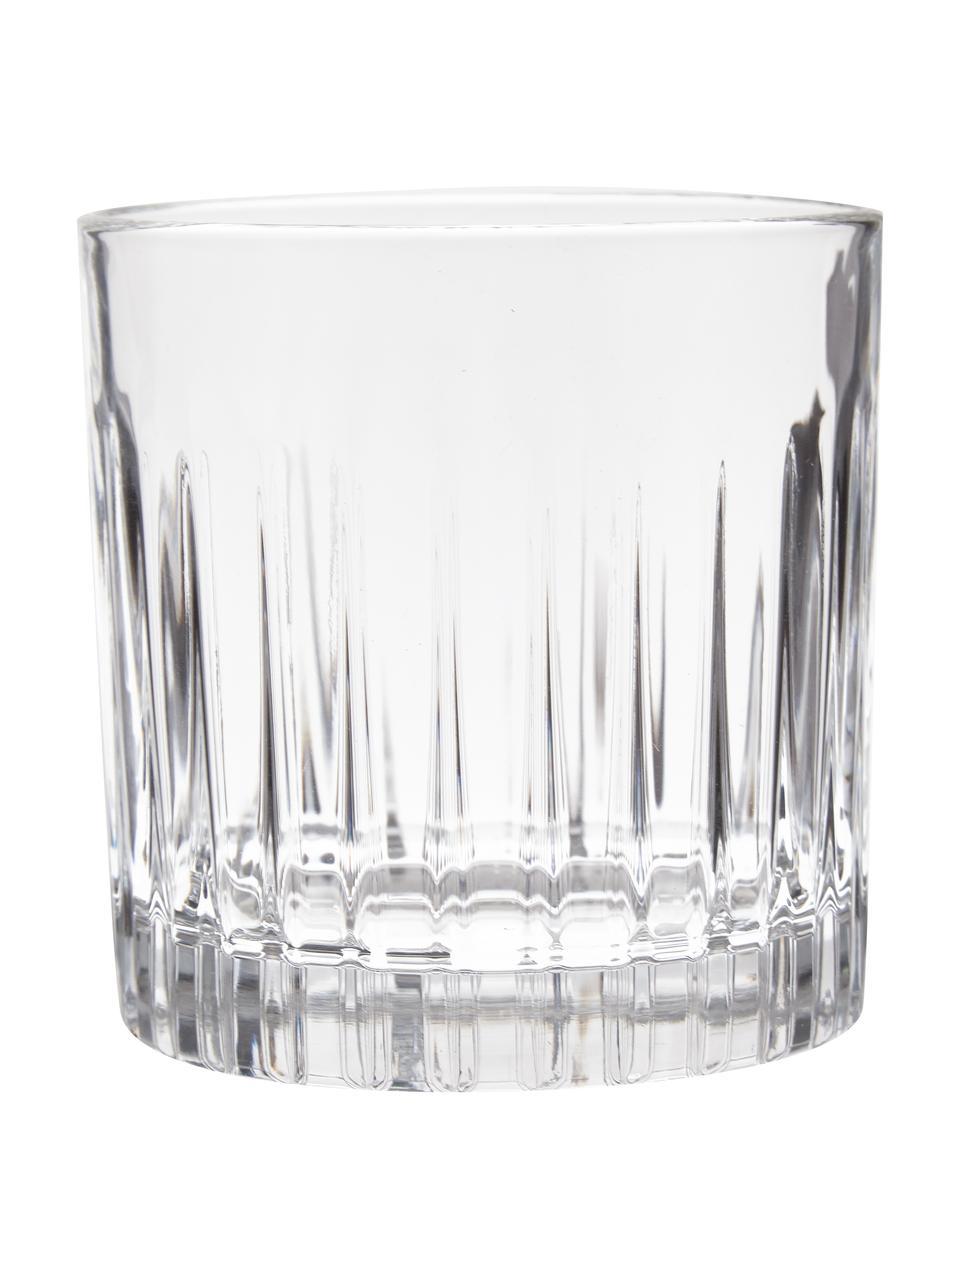 Set whisky in cristallo Timeless 7 pz, Cristallo Luxion, Trasparente, Set in varie misure